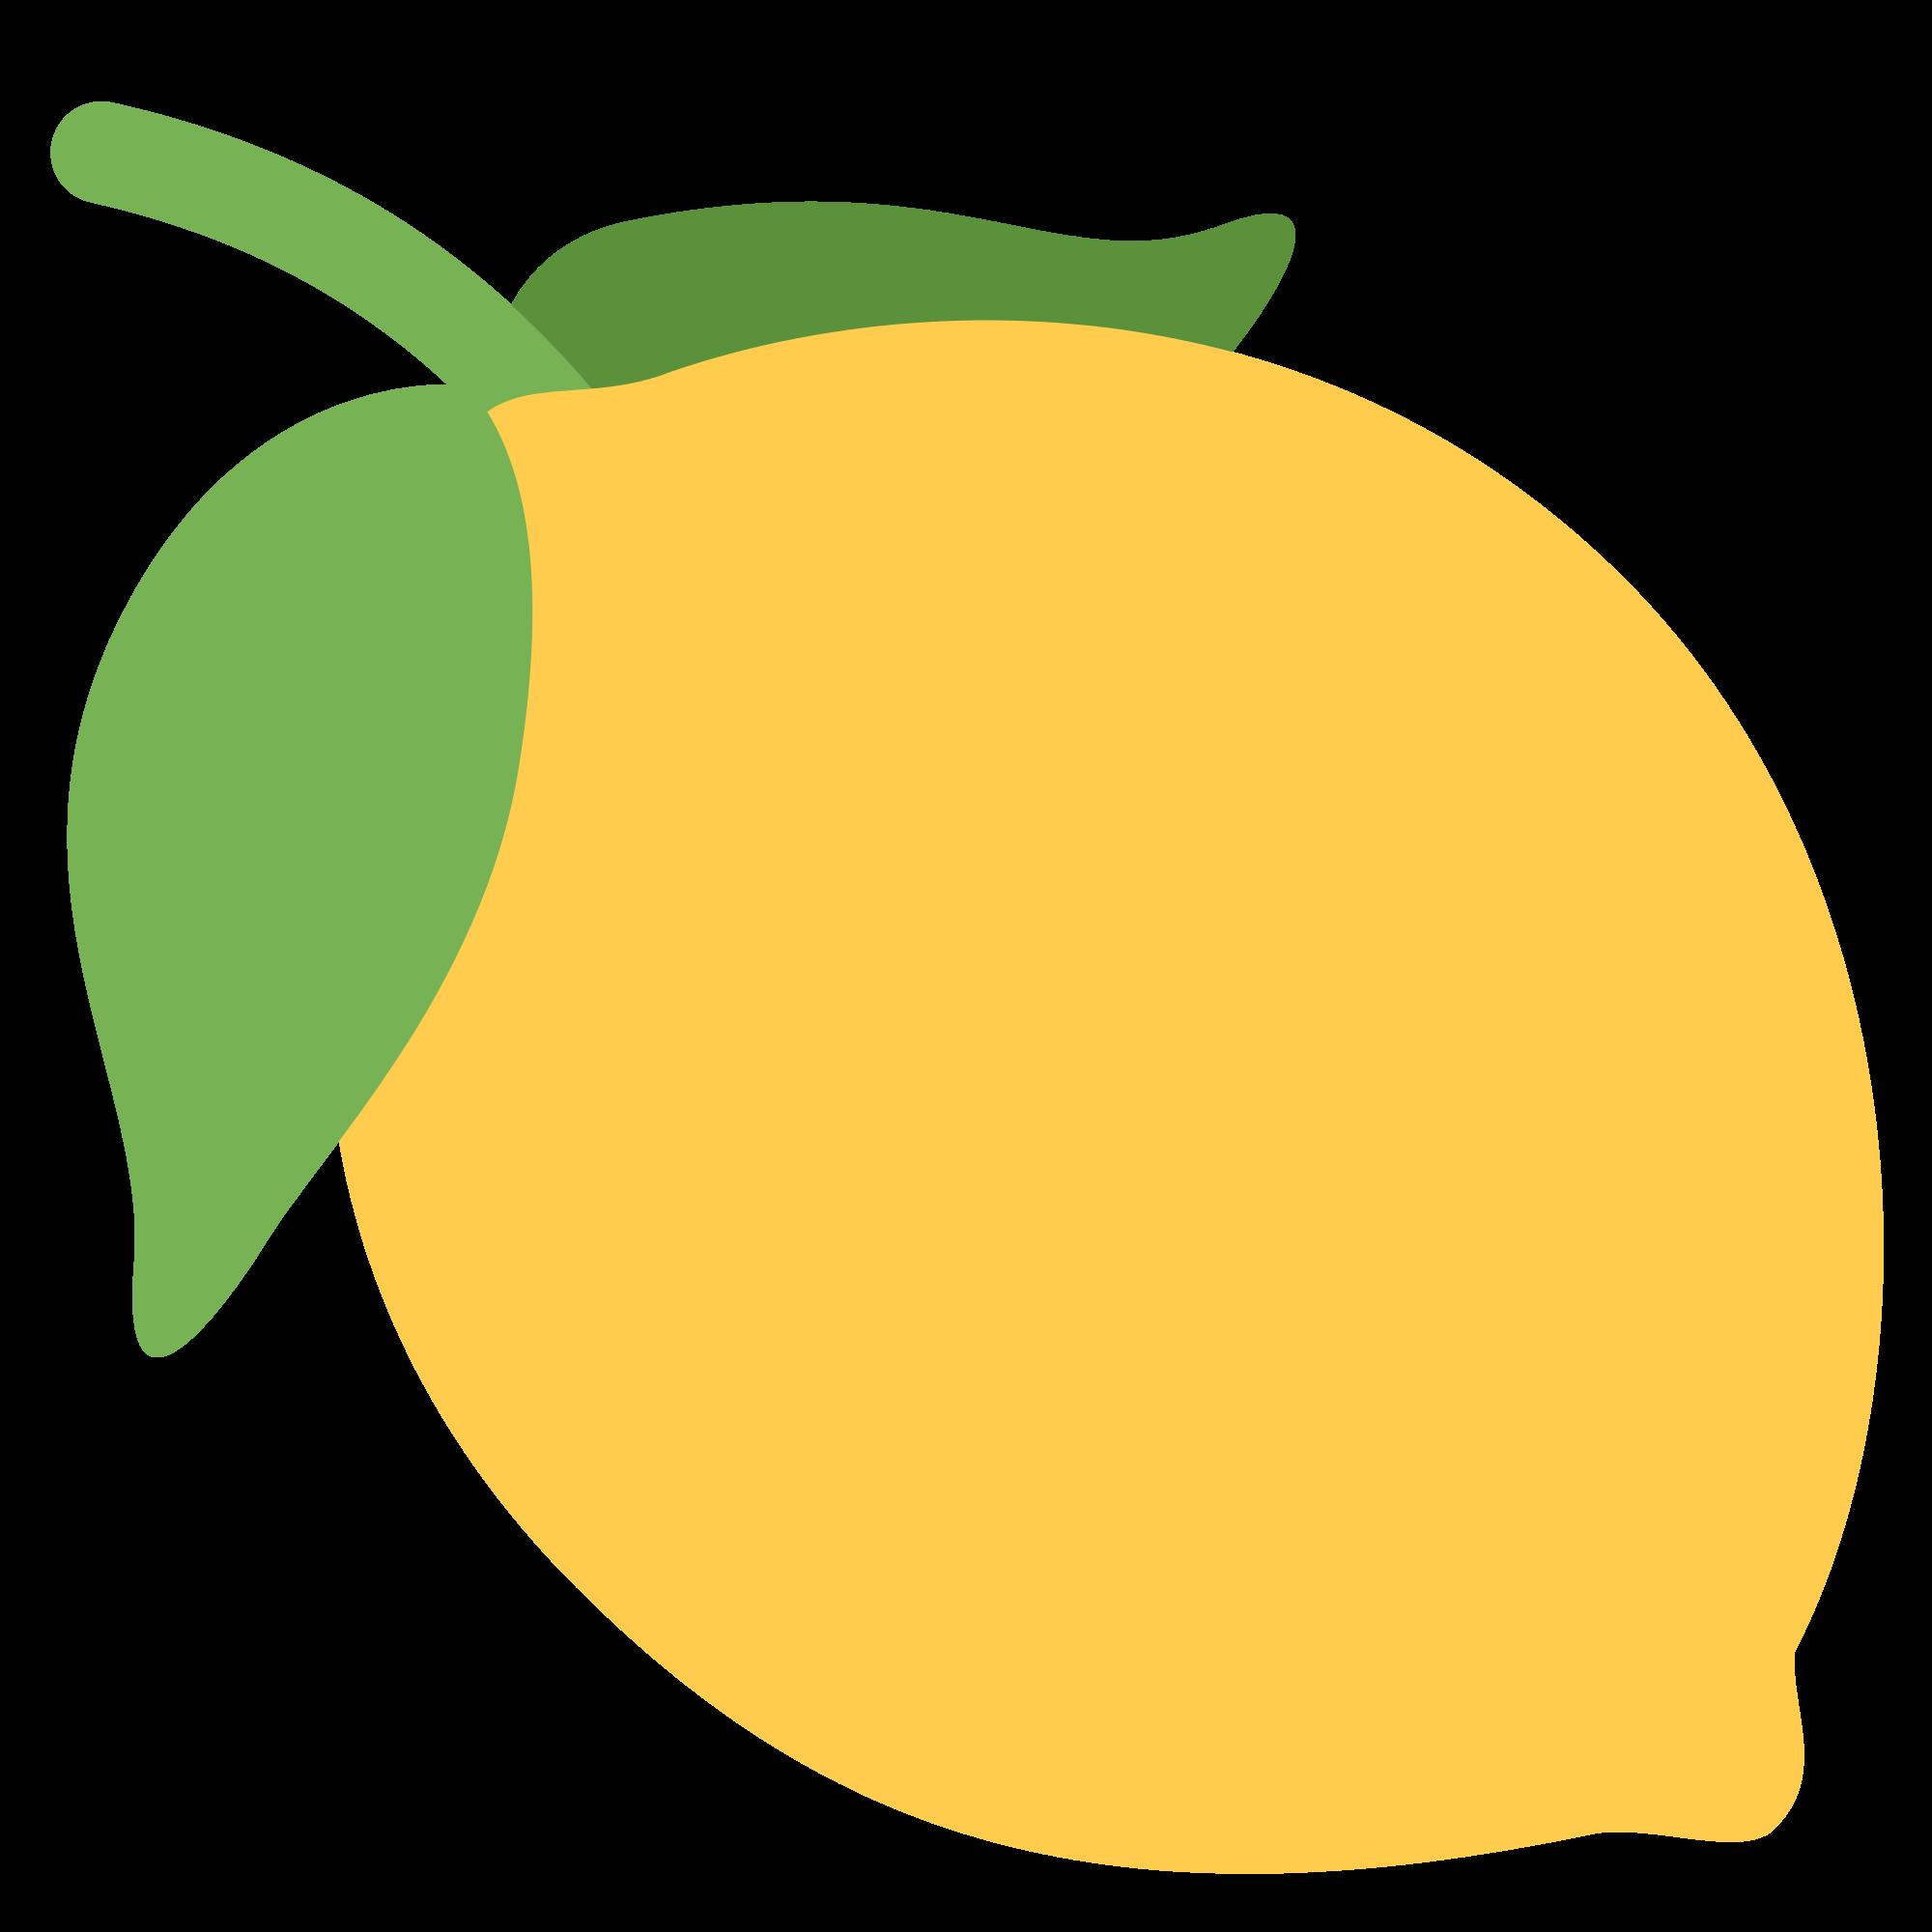 Lemons clipart citrus tree. File twemoji f b